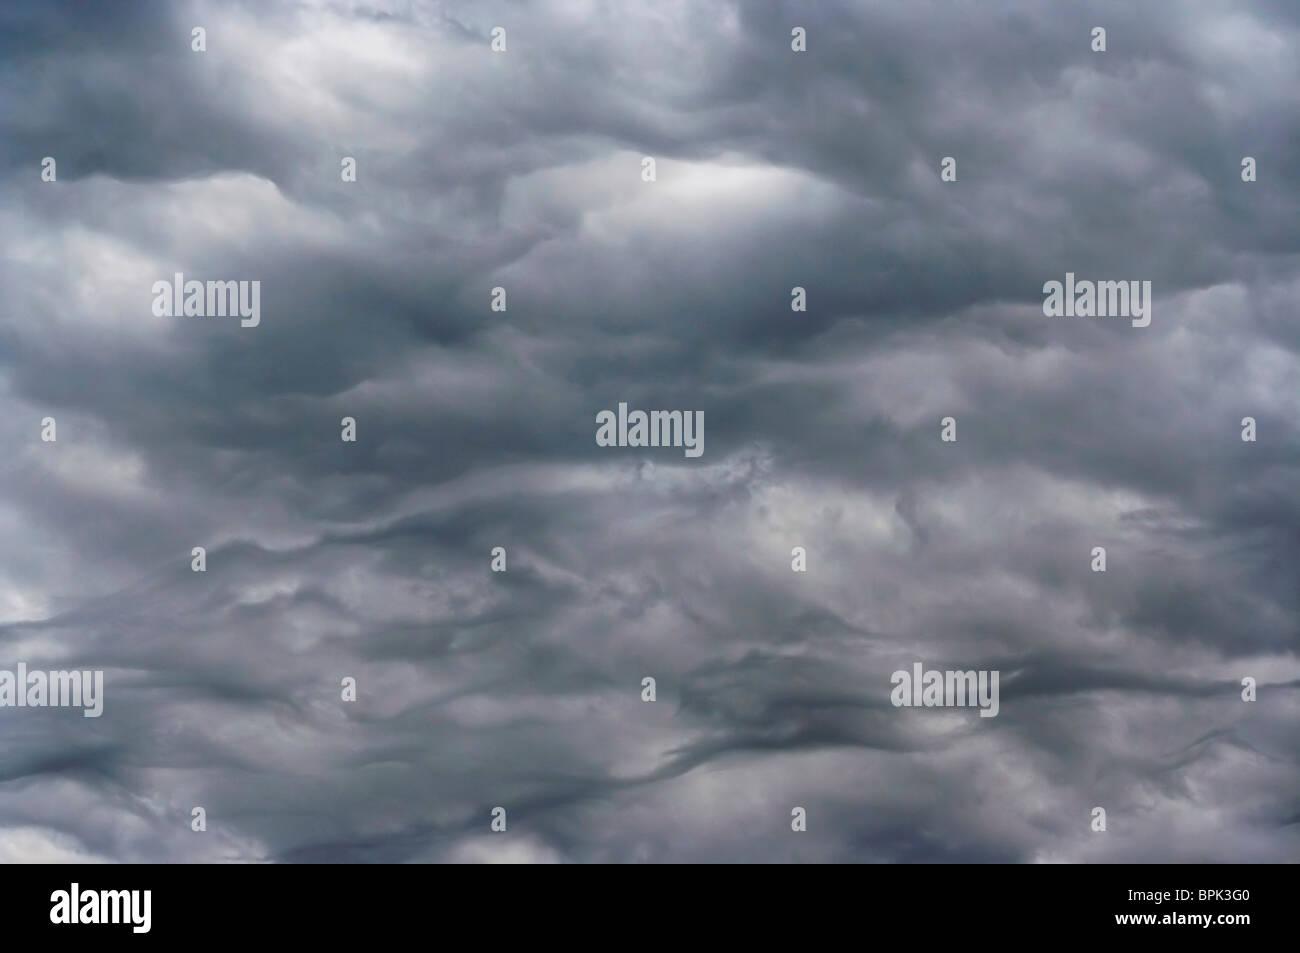 Shot of the dark clouds before rain - Stock Image